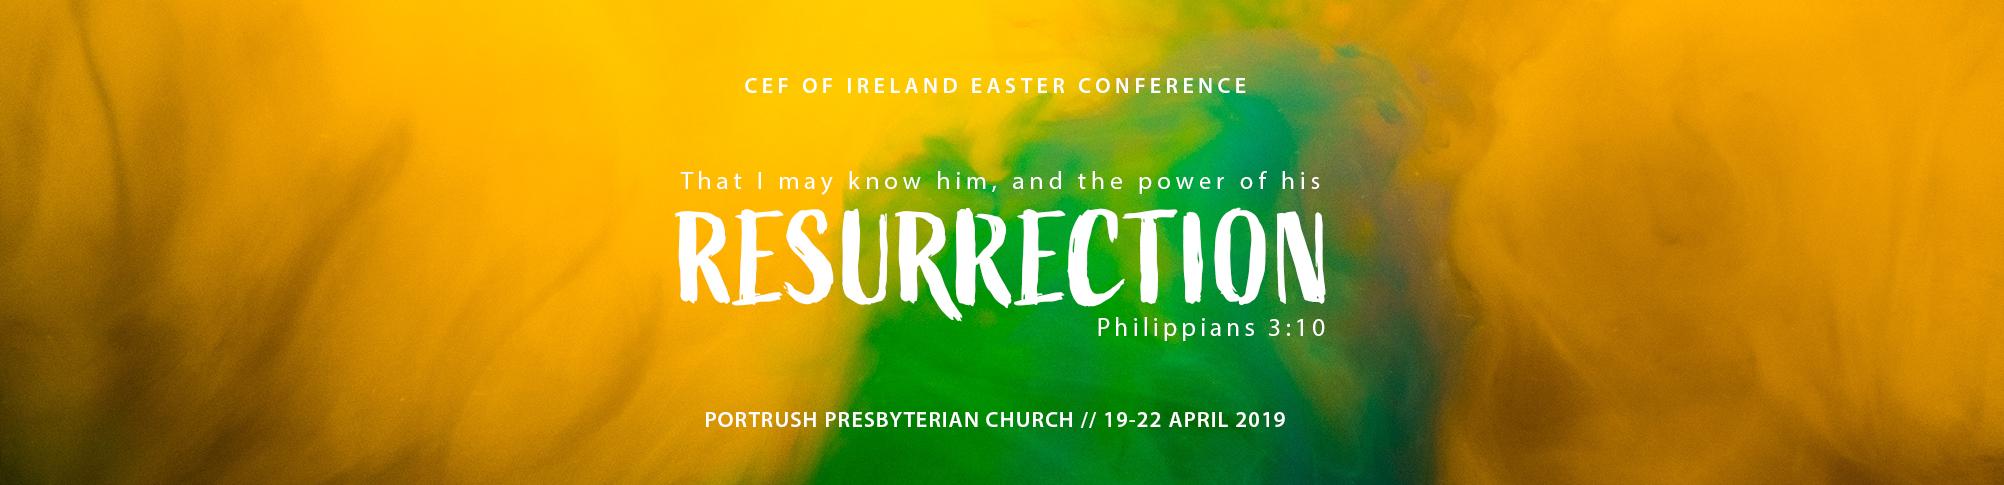 Easter-Conference-Banner-2019